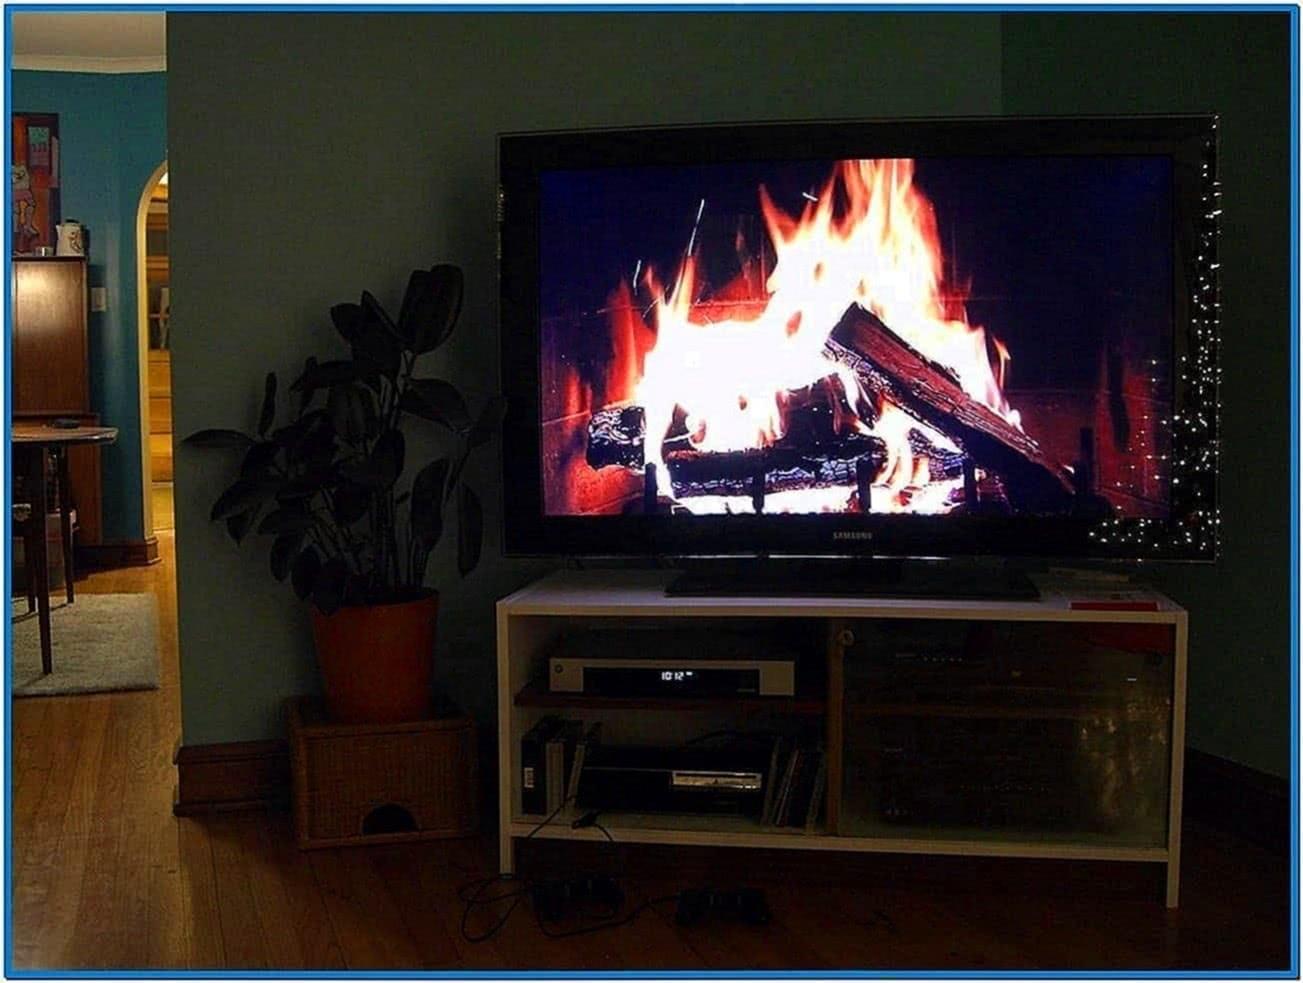 Fireplace Screensaver for Lg TV